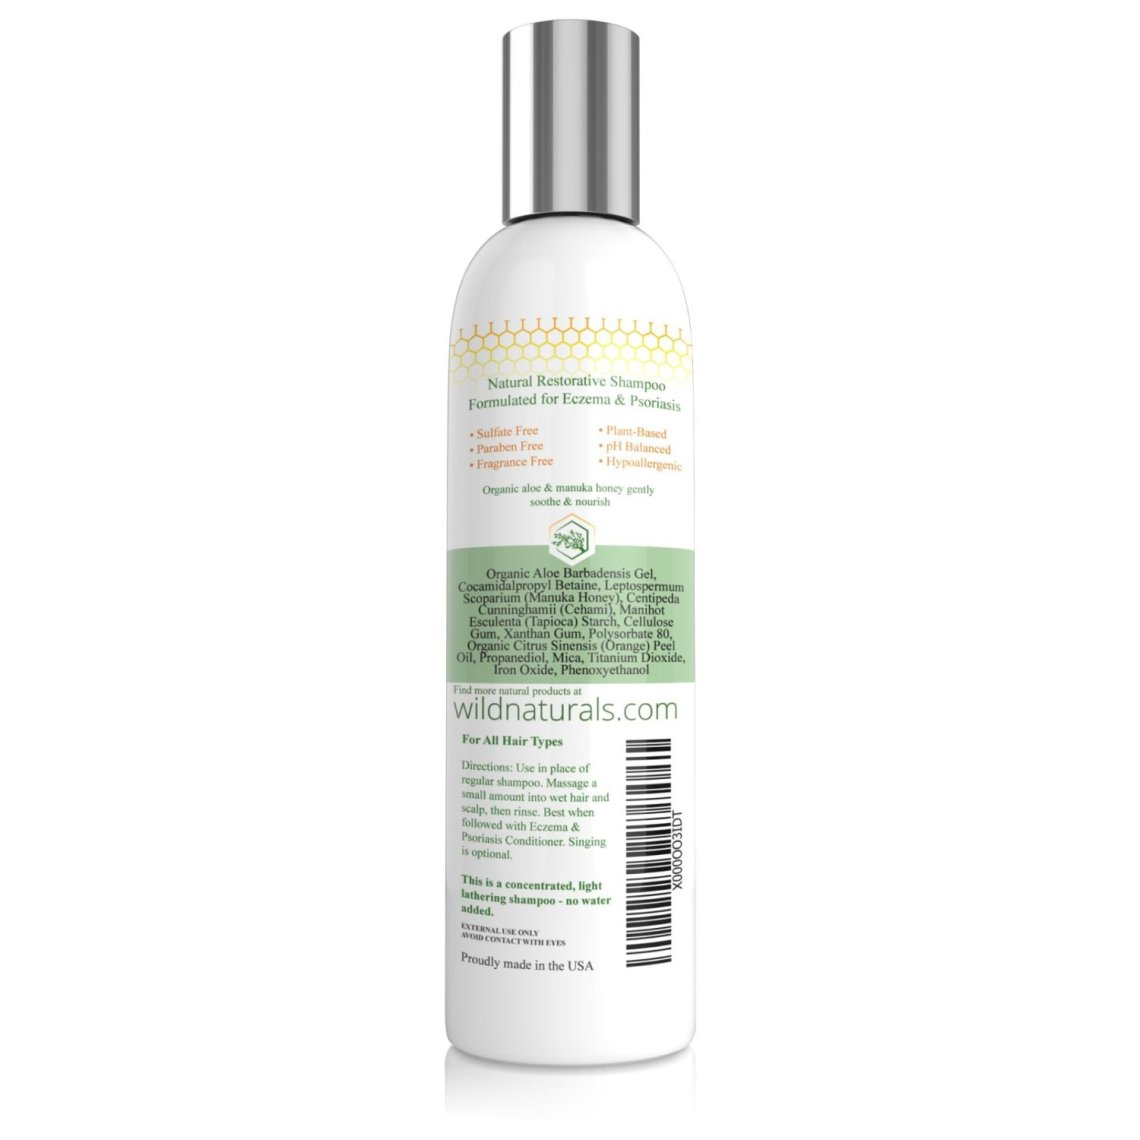 Wild Naturals Eczema/Psoriasis Shampoo/Conditioner Review